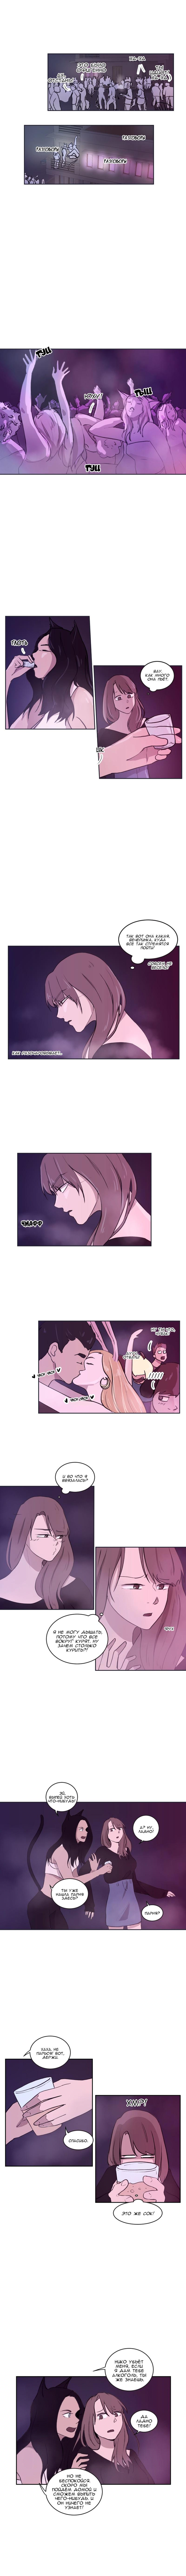 https://r1.ninemanga.com/comics/pic2/58/31802/416863/1533717061179.jpg Page 1